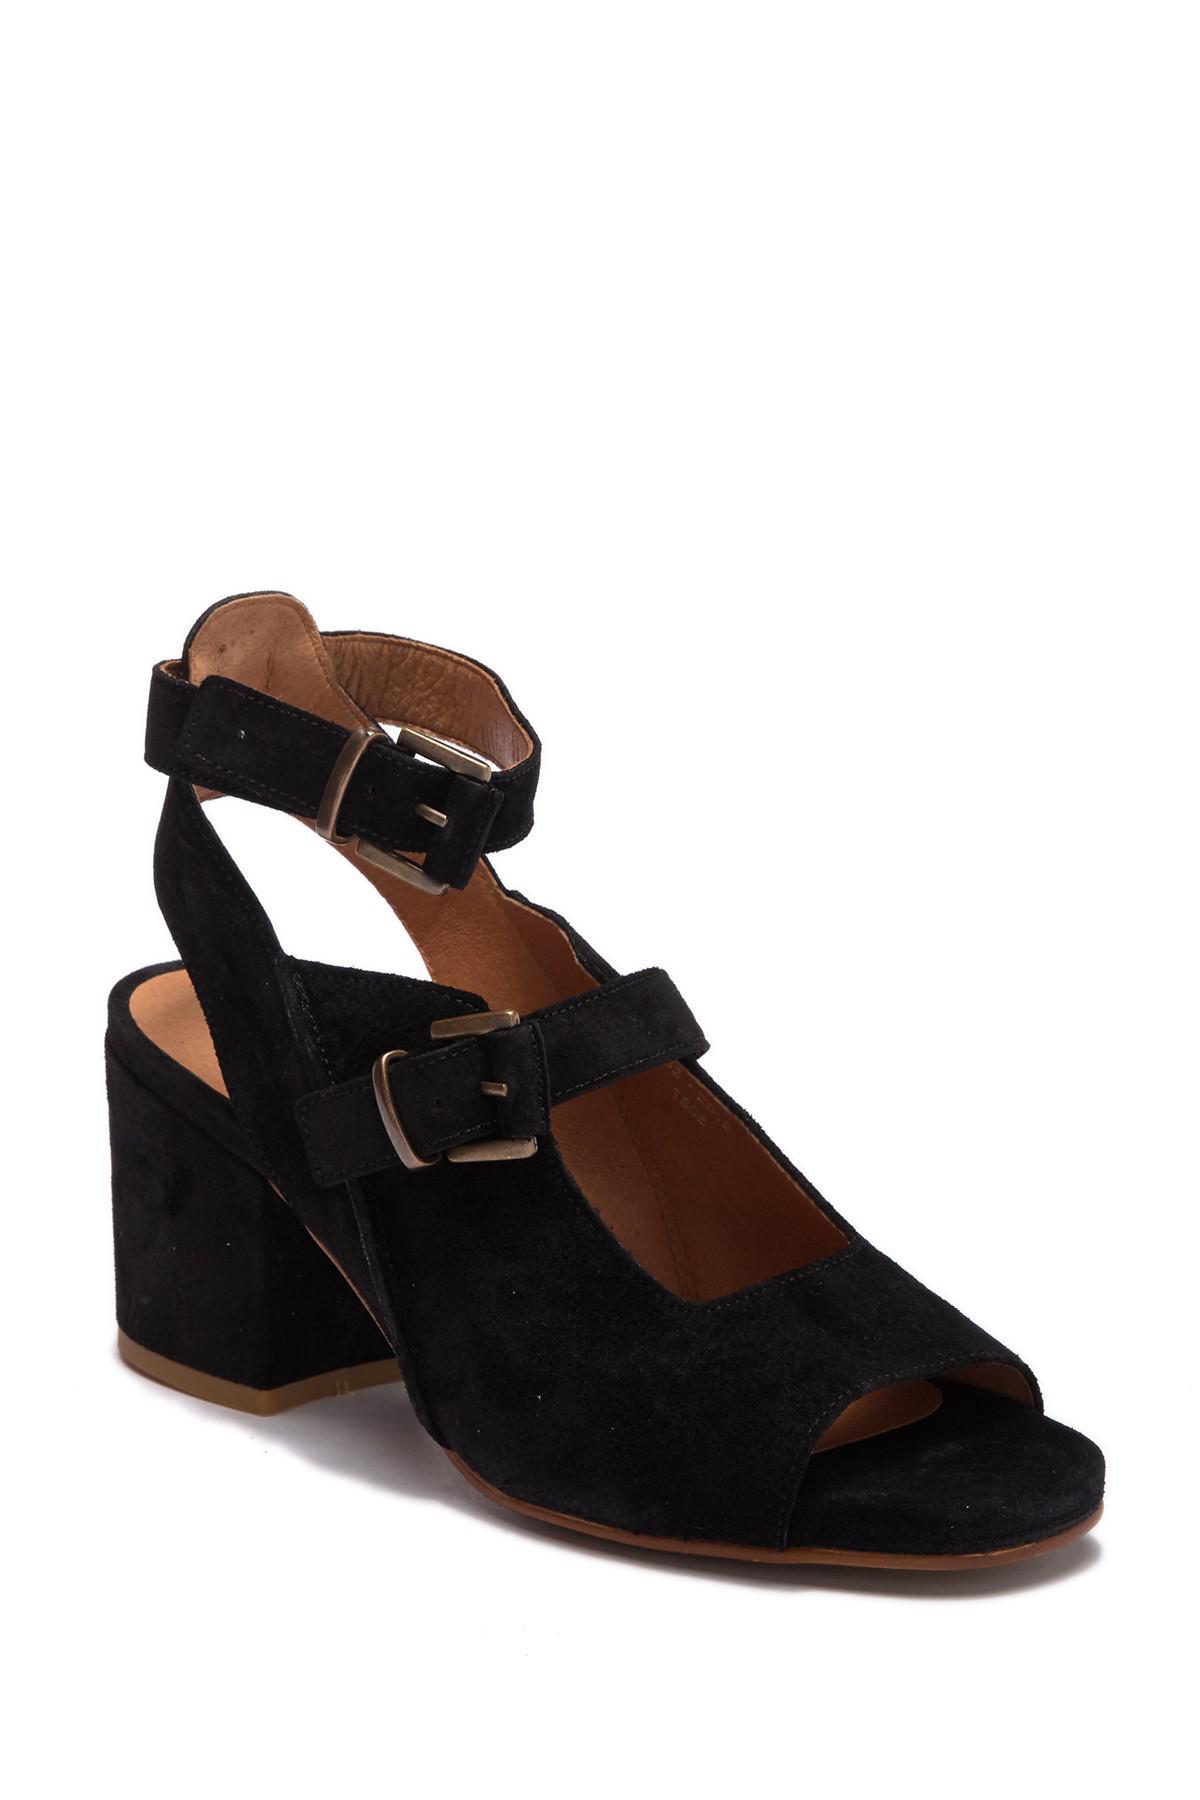 567bd4c1402 H by Hudson. Women s Black Rona Suede Block Heel Sandal.  270  100 From Nordstrom  Rack